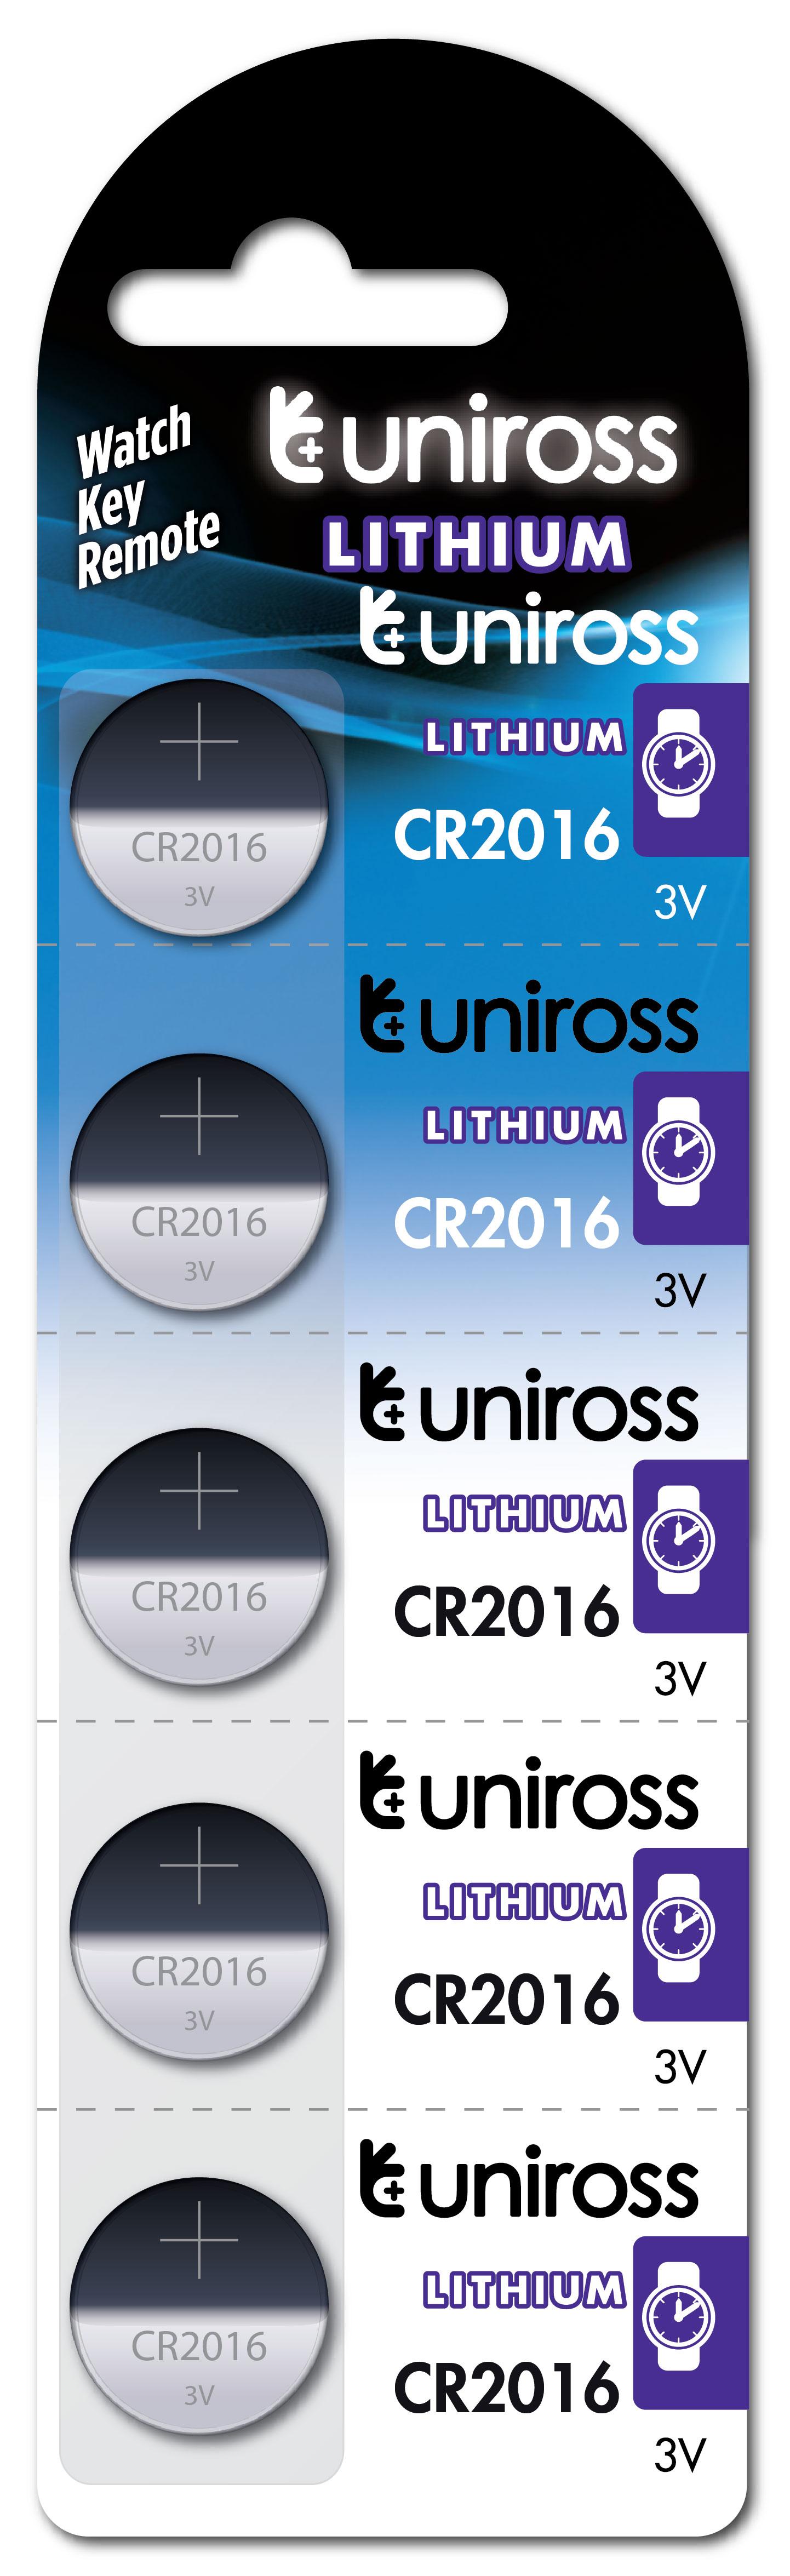 Button_Cell_[U5CR2016] UNIROSS BP5 CR2016 LITHIUM.jpg